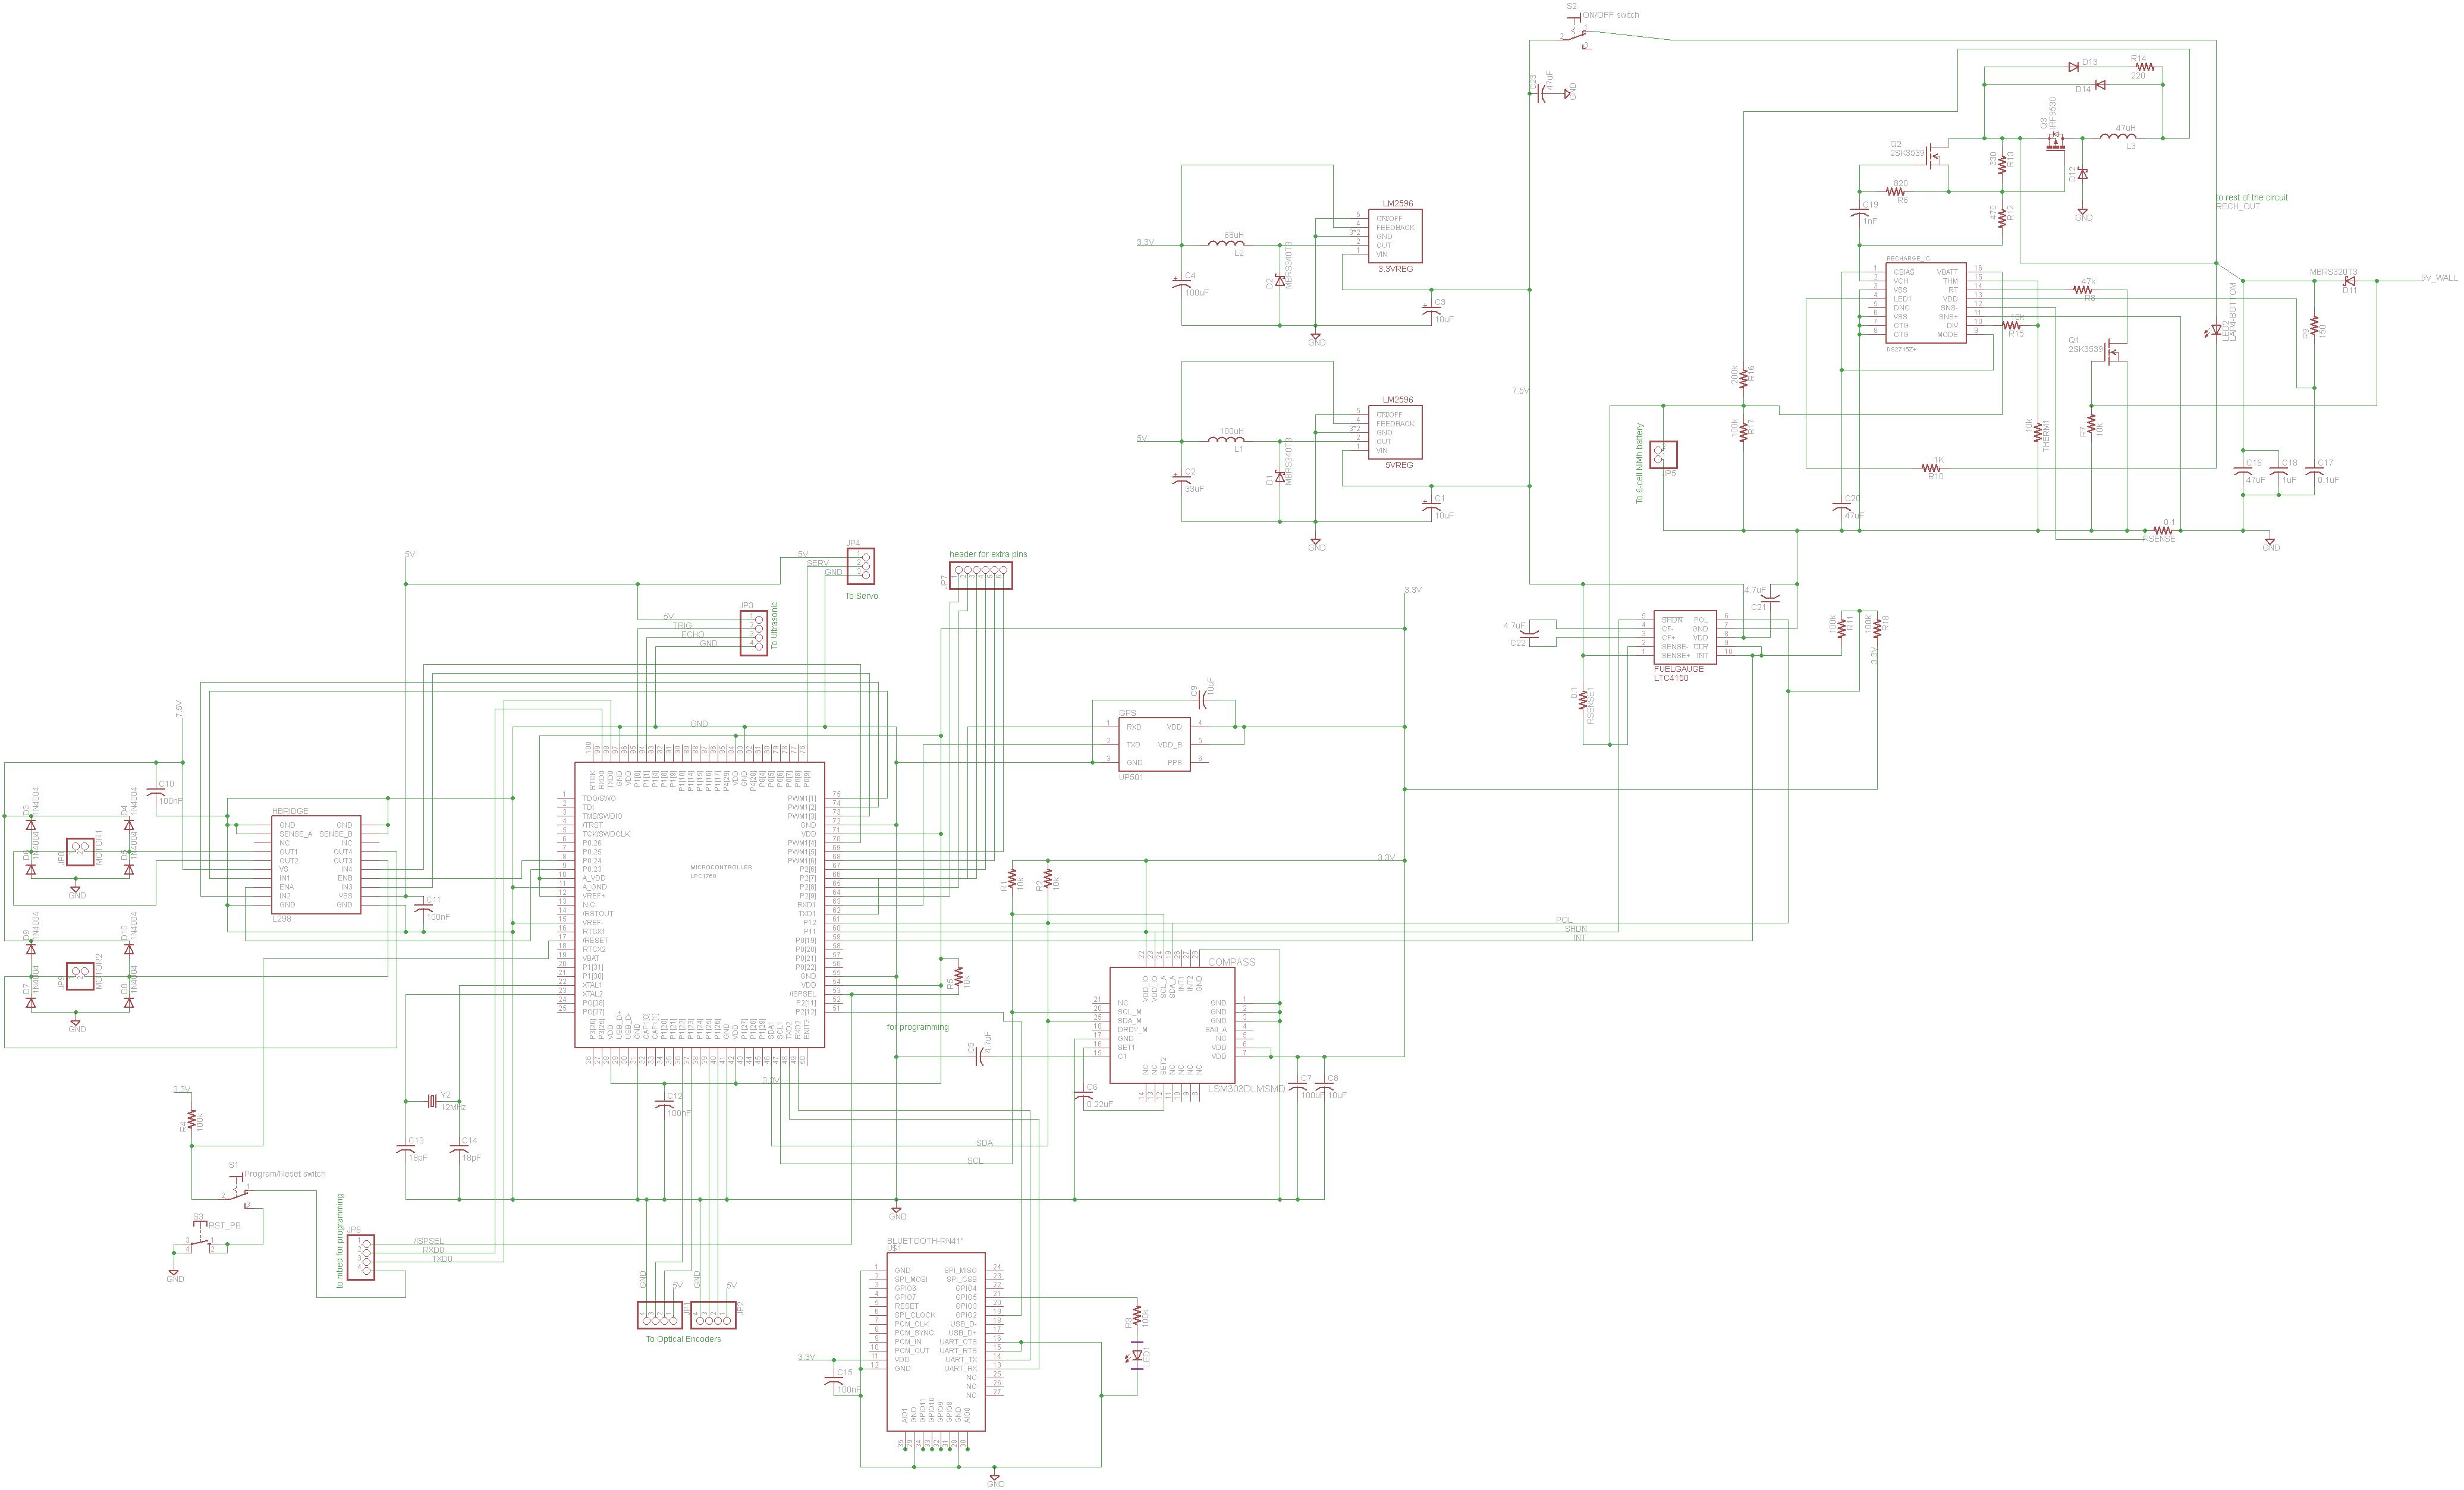 Alex Curtis Lab Notebook Voltdividercircuitdiagramgif 3190 Bytes Preliminary Schematic